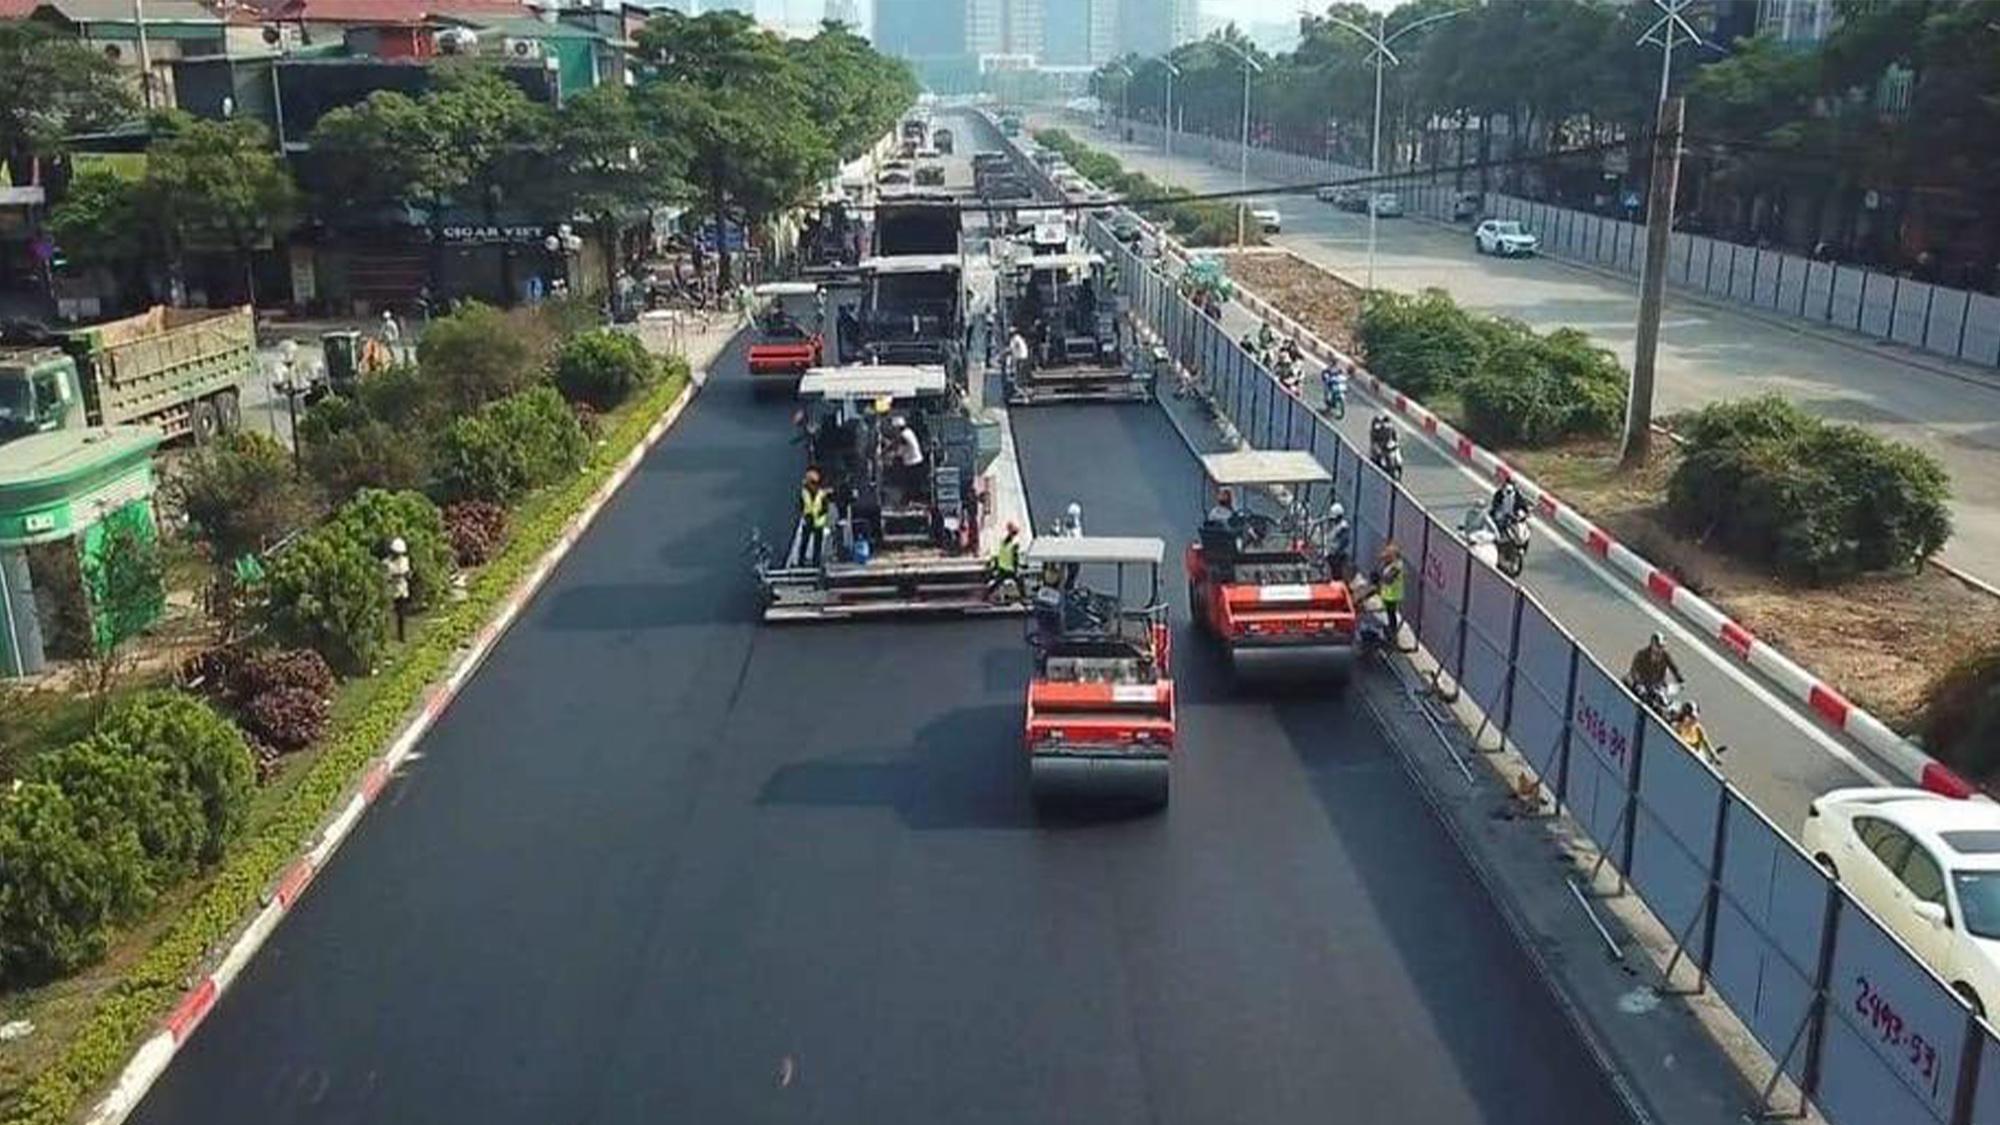 Resurfacing work on the Hanoi Street Circuit